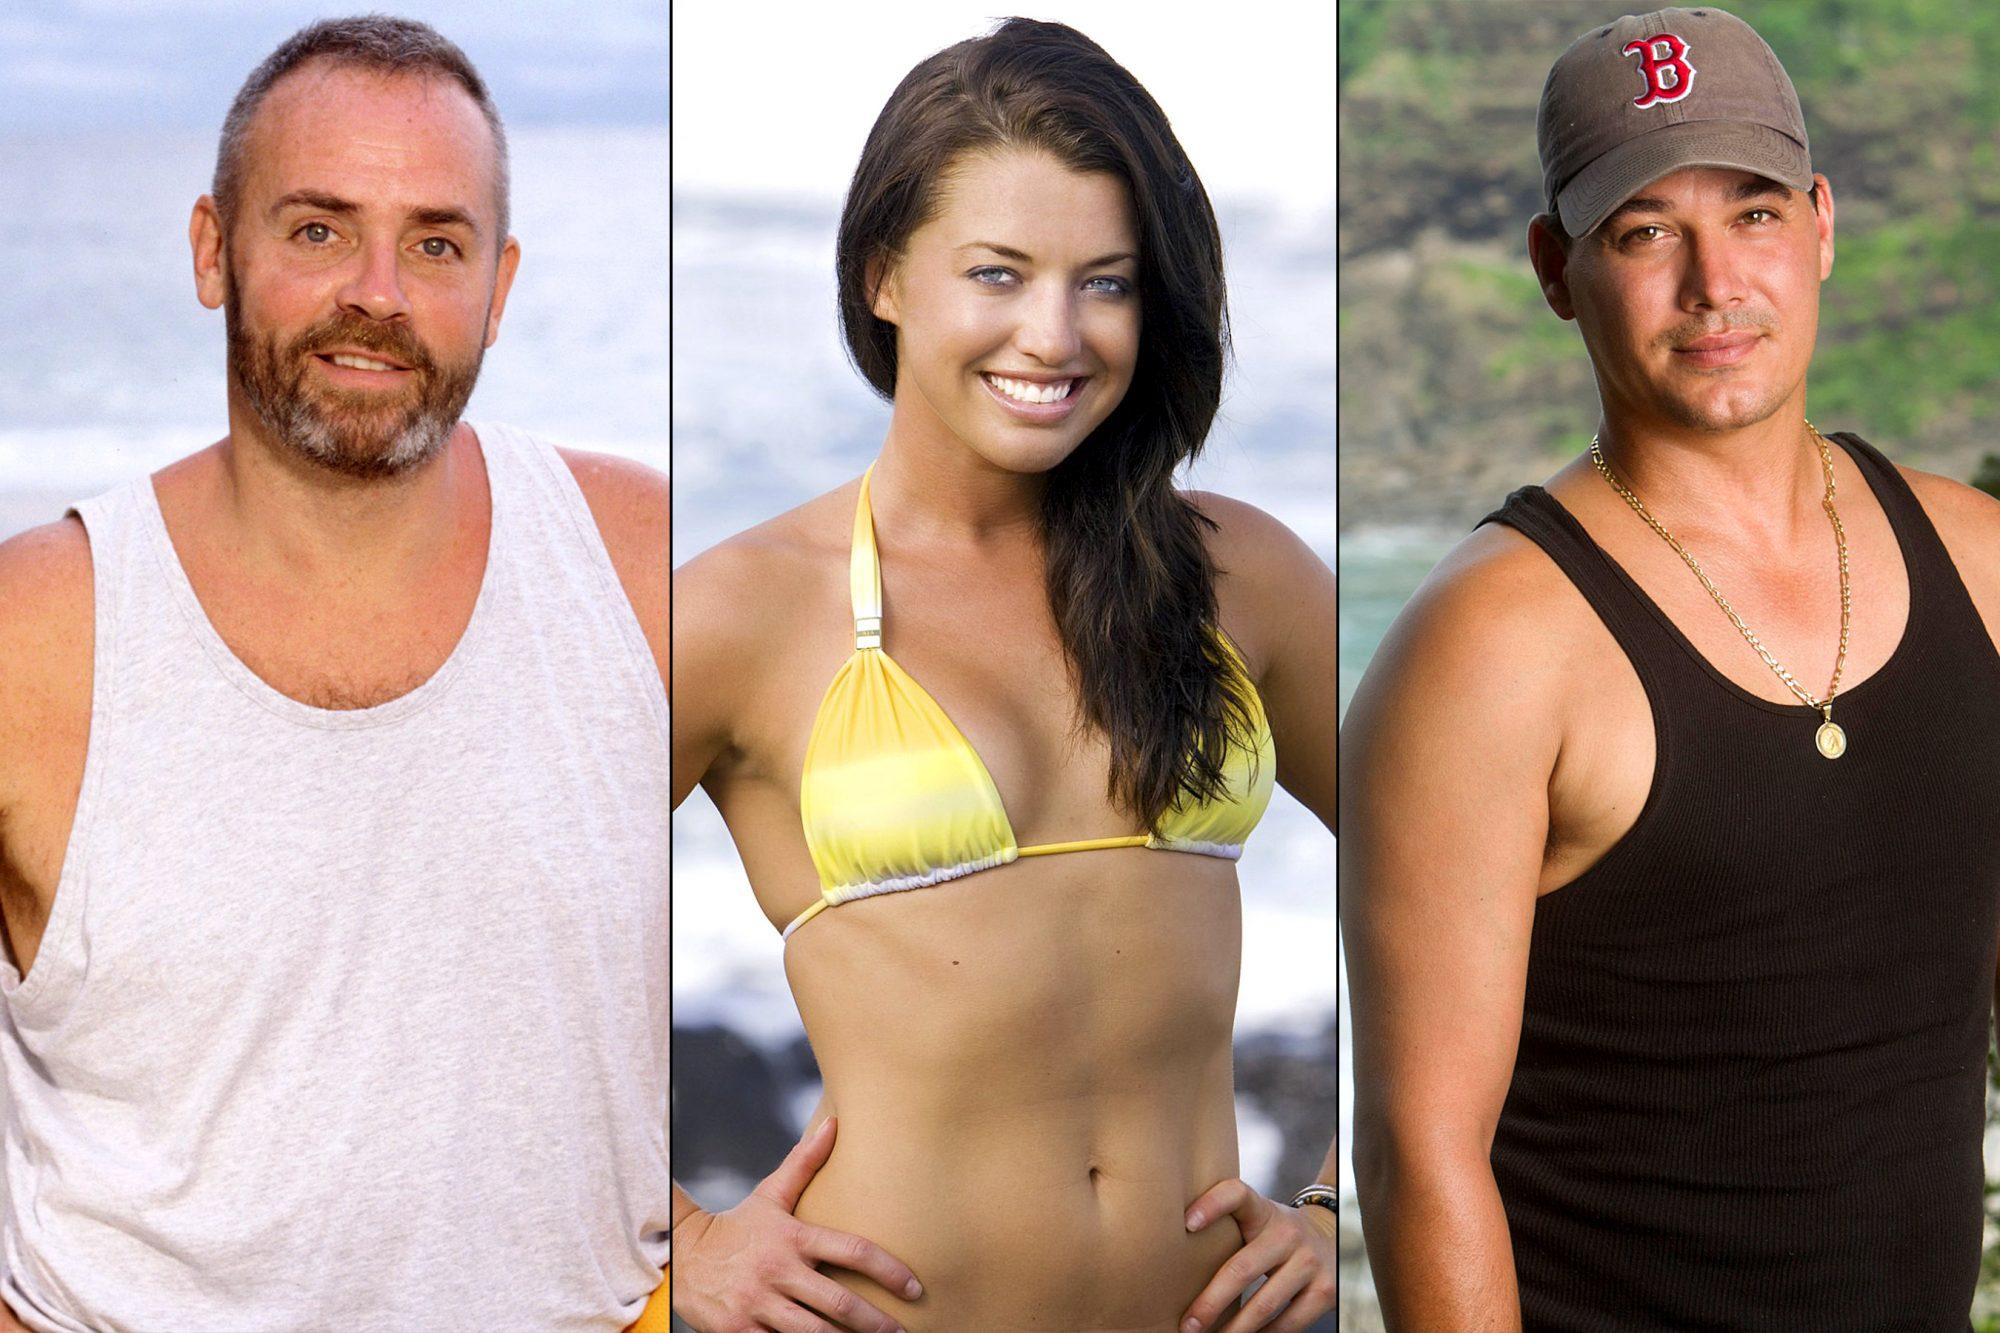 Survivor Winners: Richard Hatch / Parvati Shallow / Rob Mariano